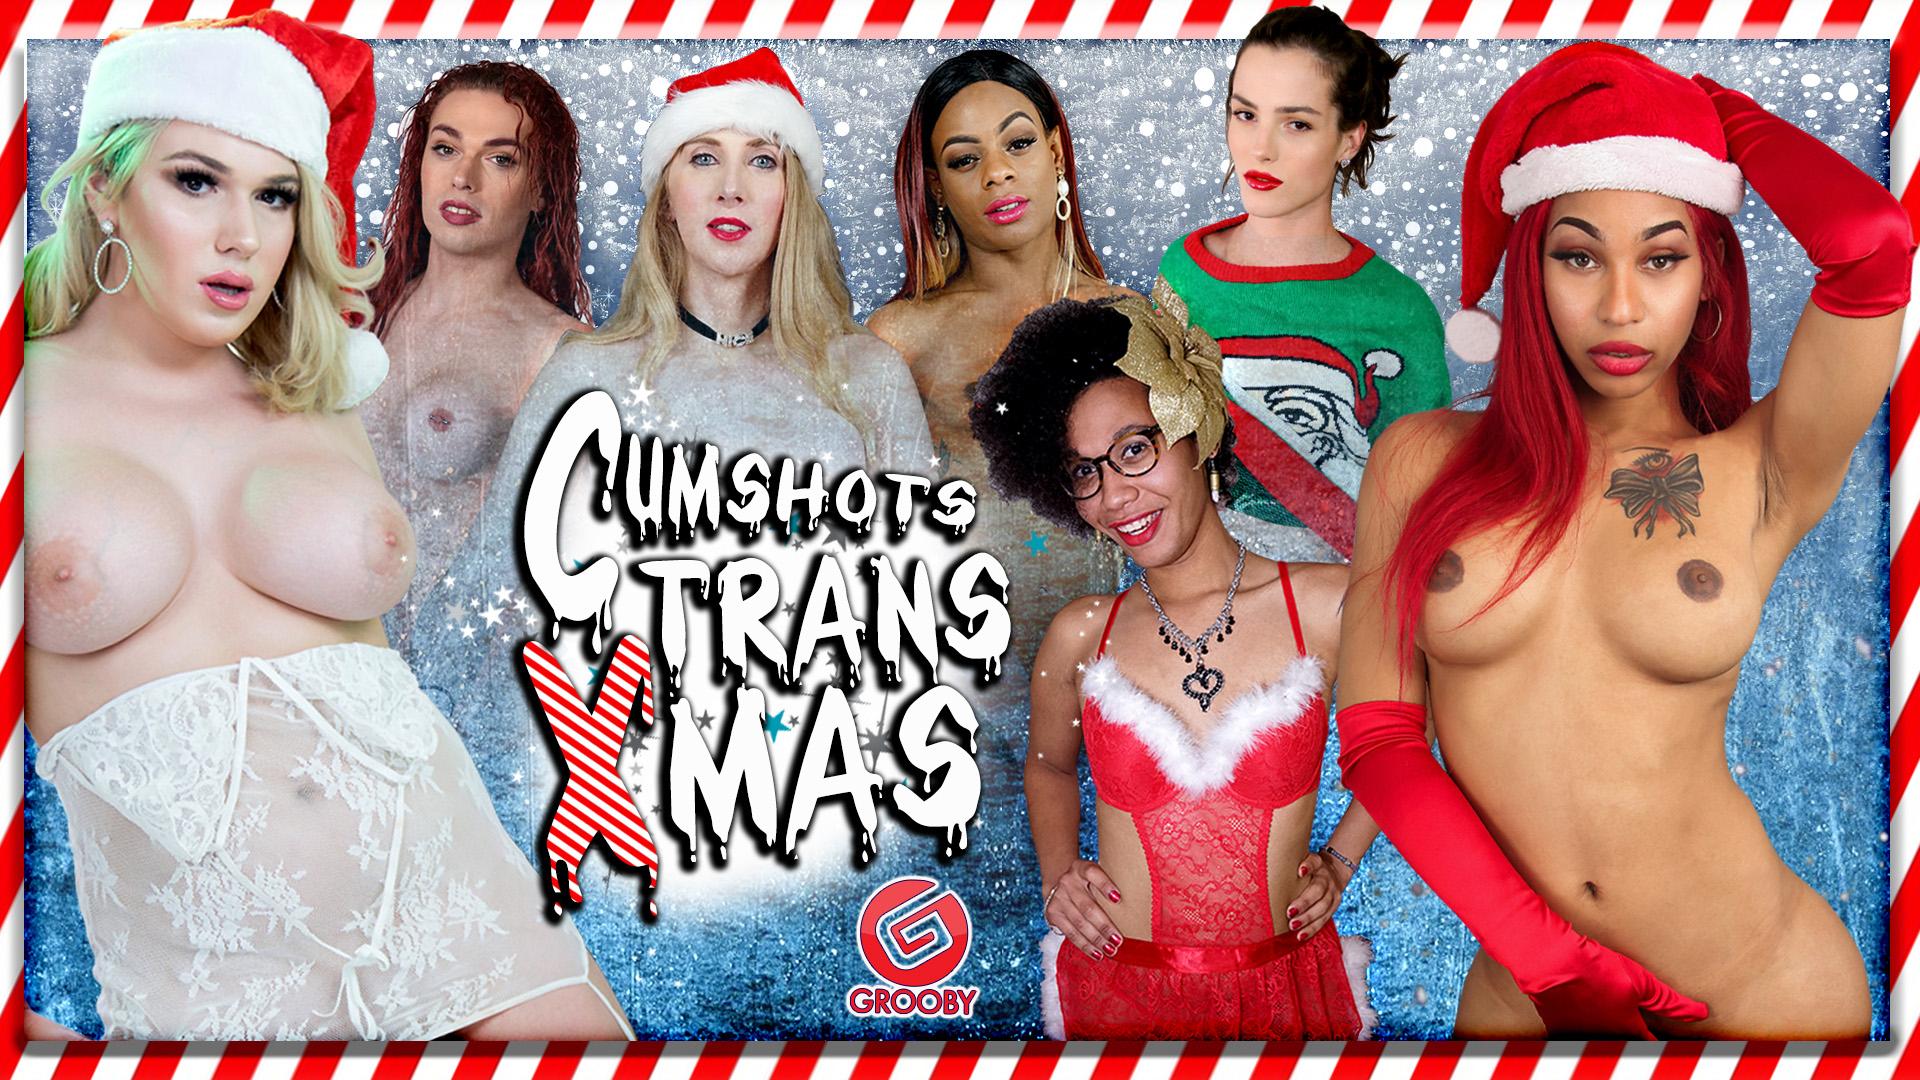 Trans Xmas Cumshots - DVD Trailer